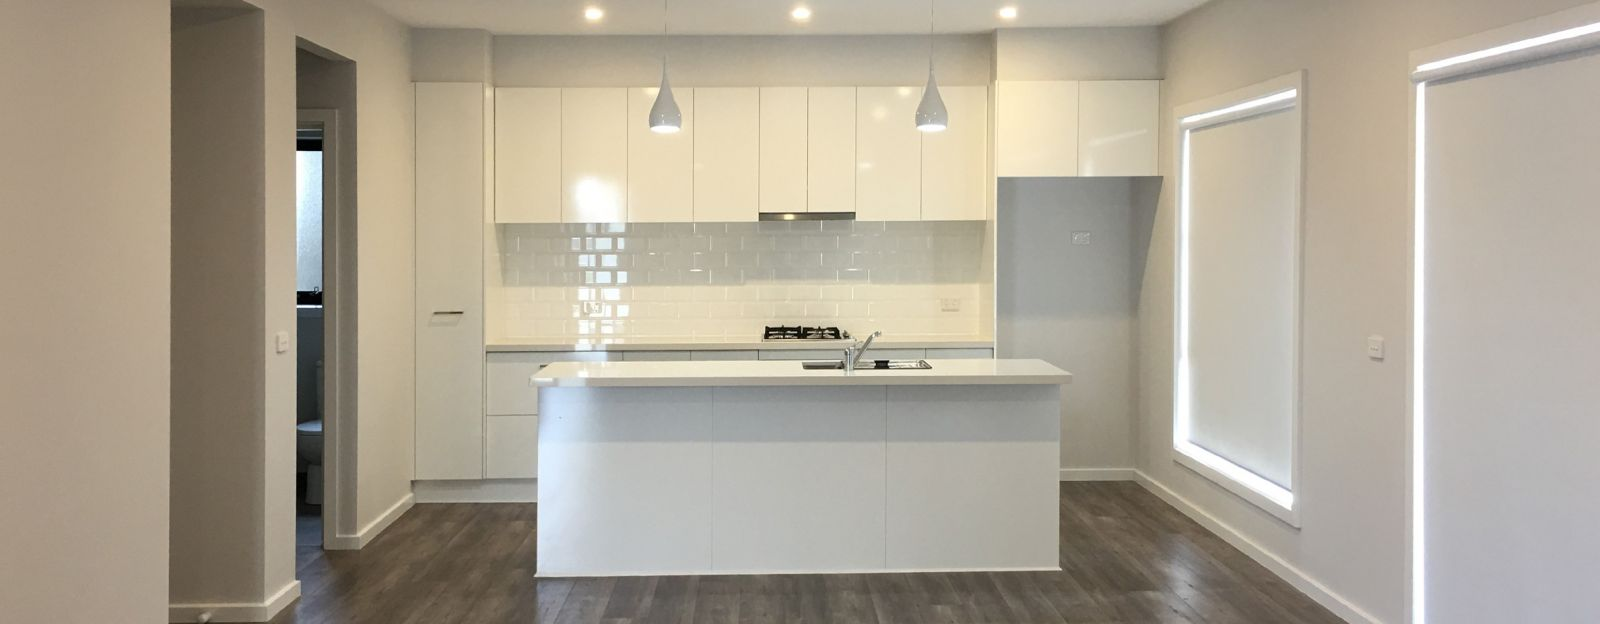 Double Storey Homes Kitchen Design